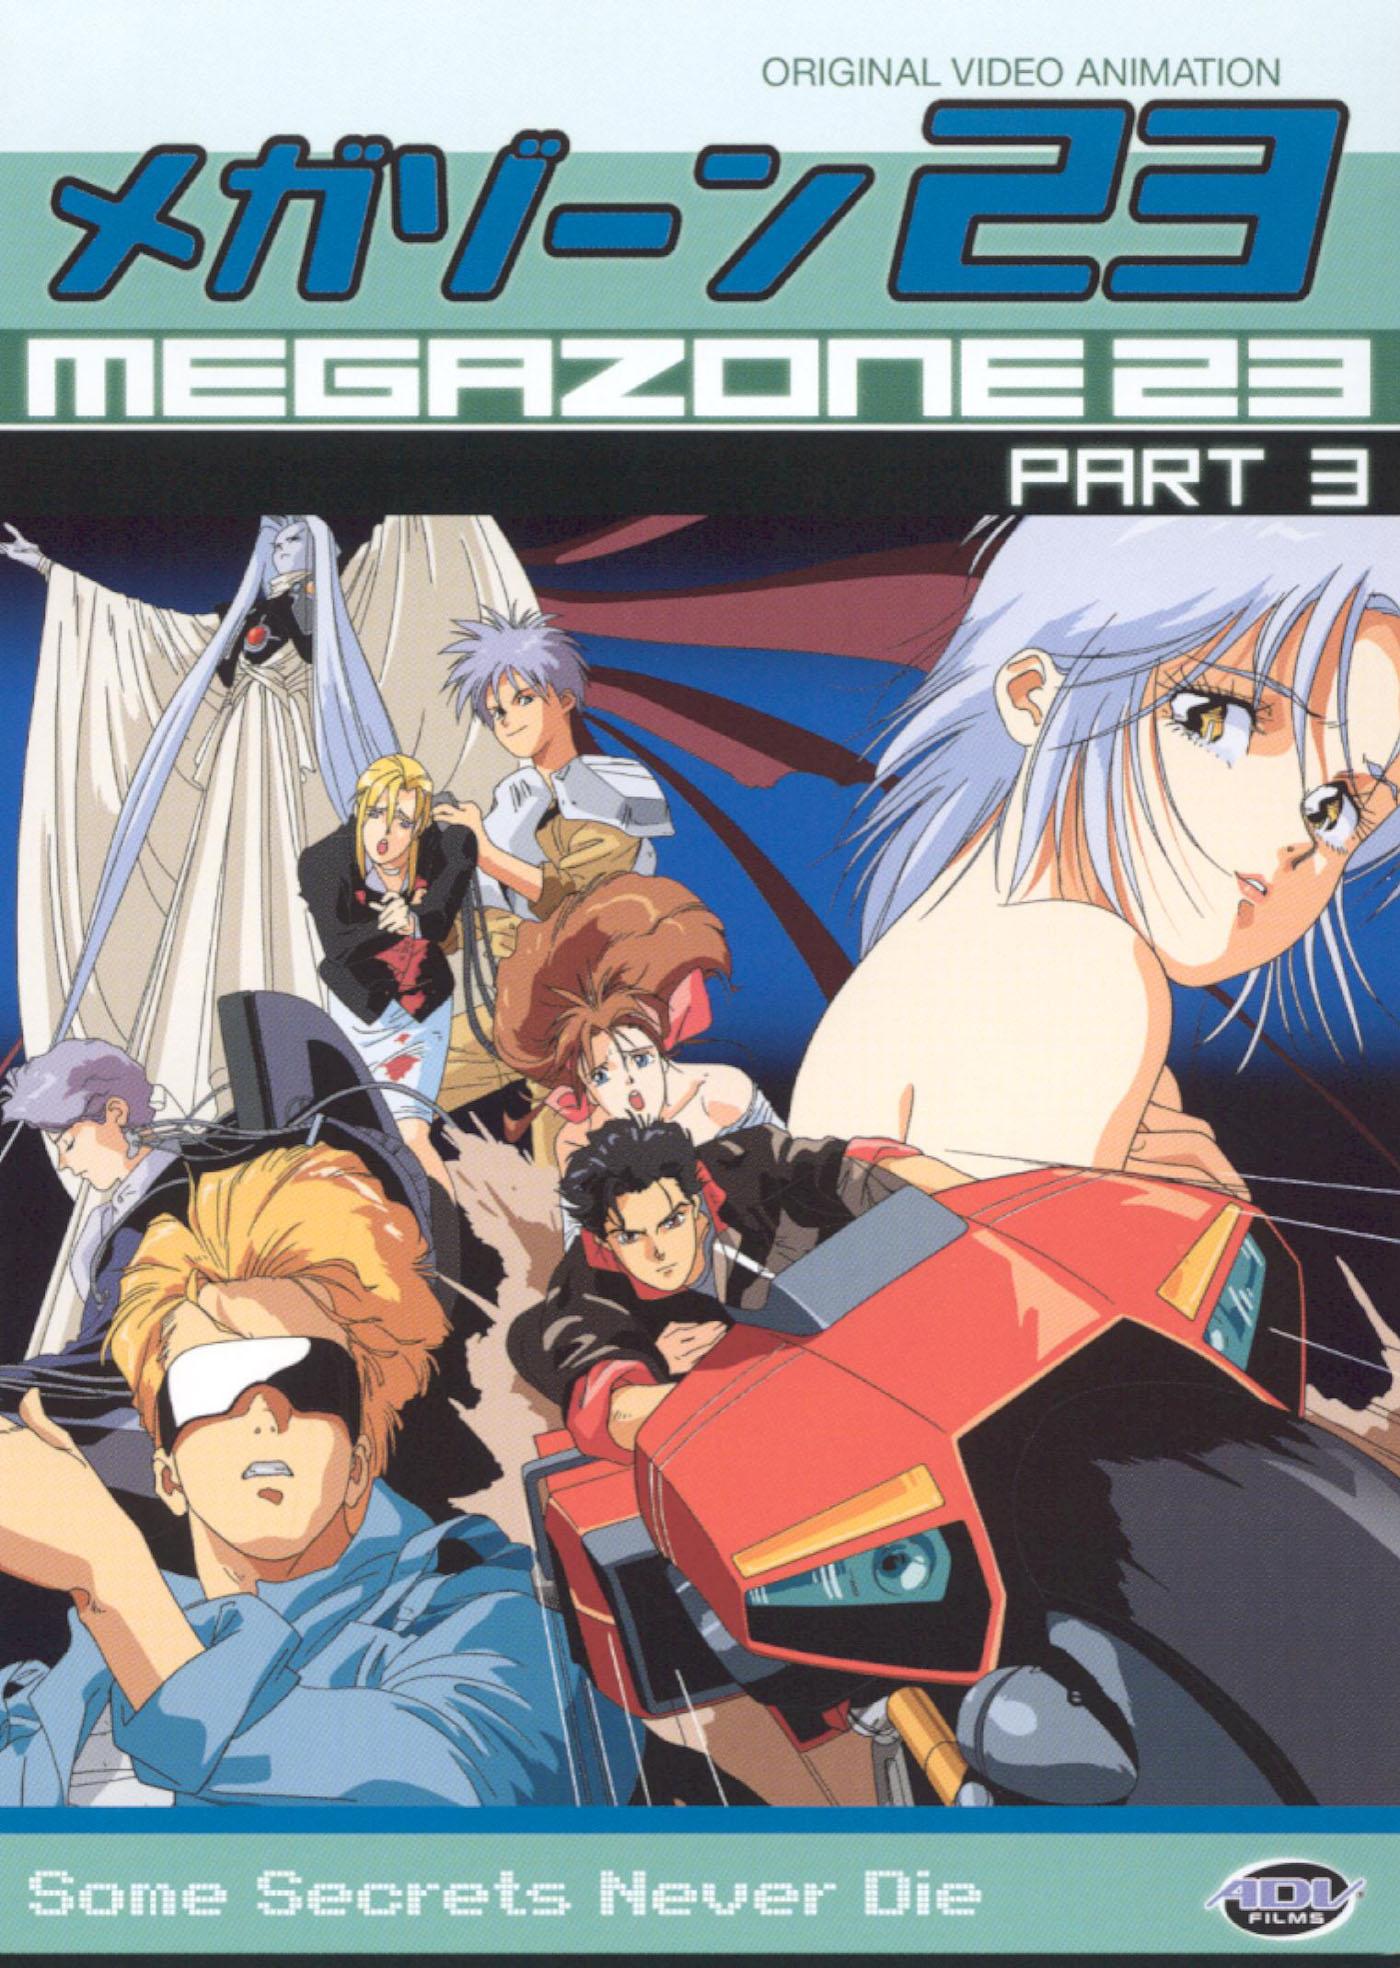 Megazone 23, Part 3 [Anime OVA]